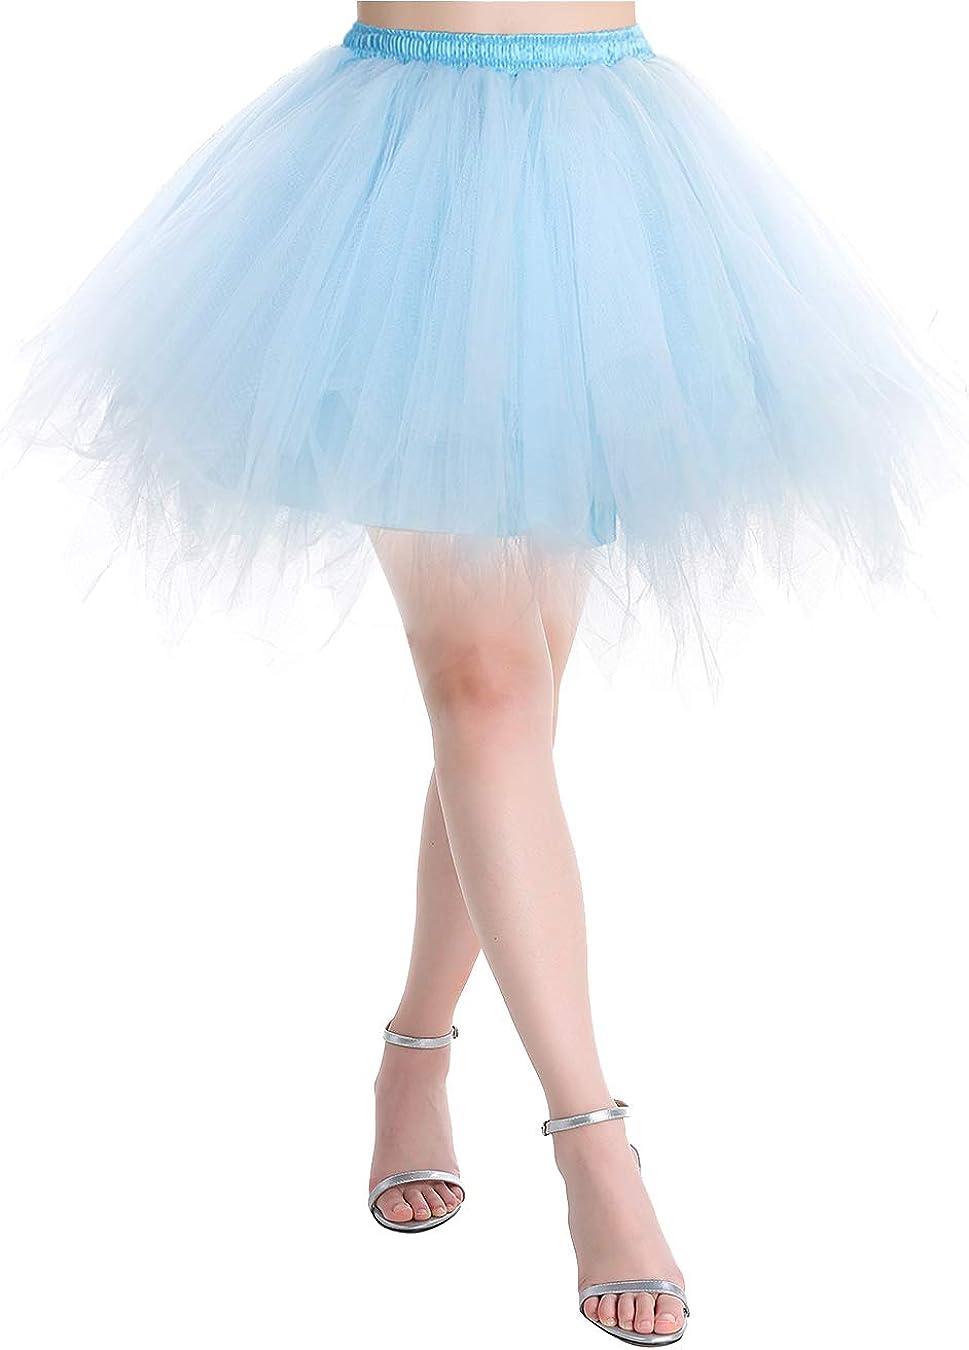 MUADRESS Women's 1950s Multi Layer Retro Petticoat Tulle Tutu Party Dance Skirt